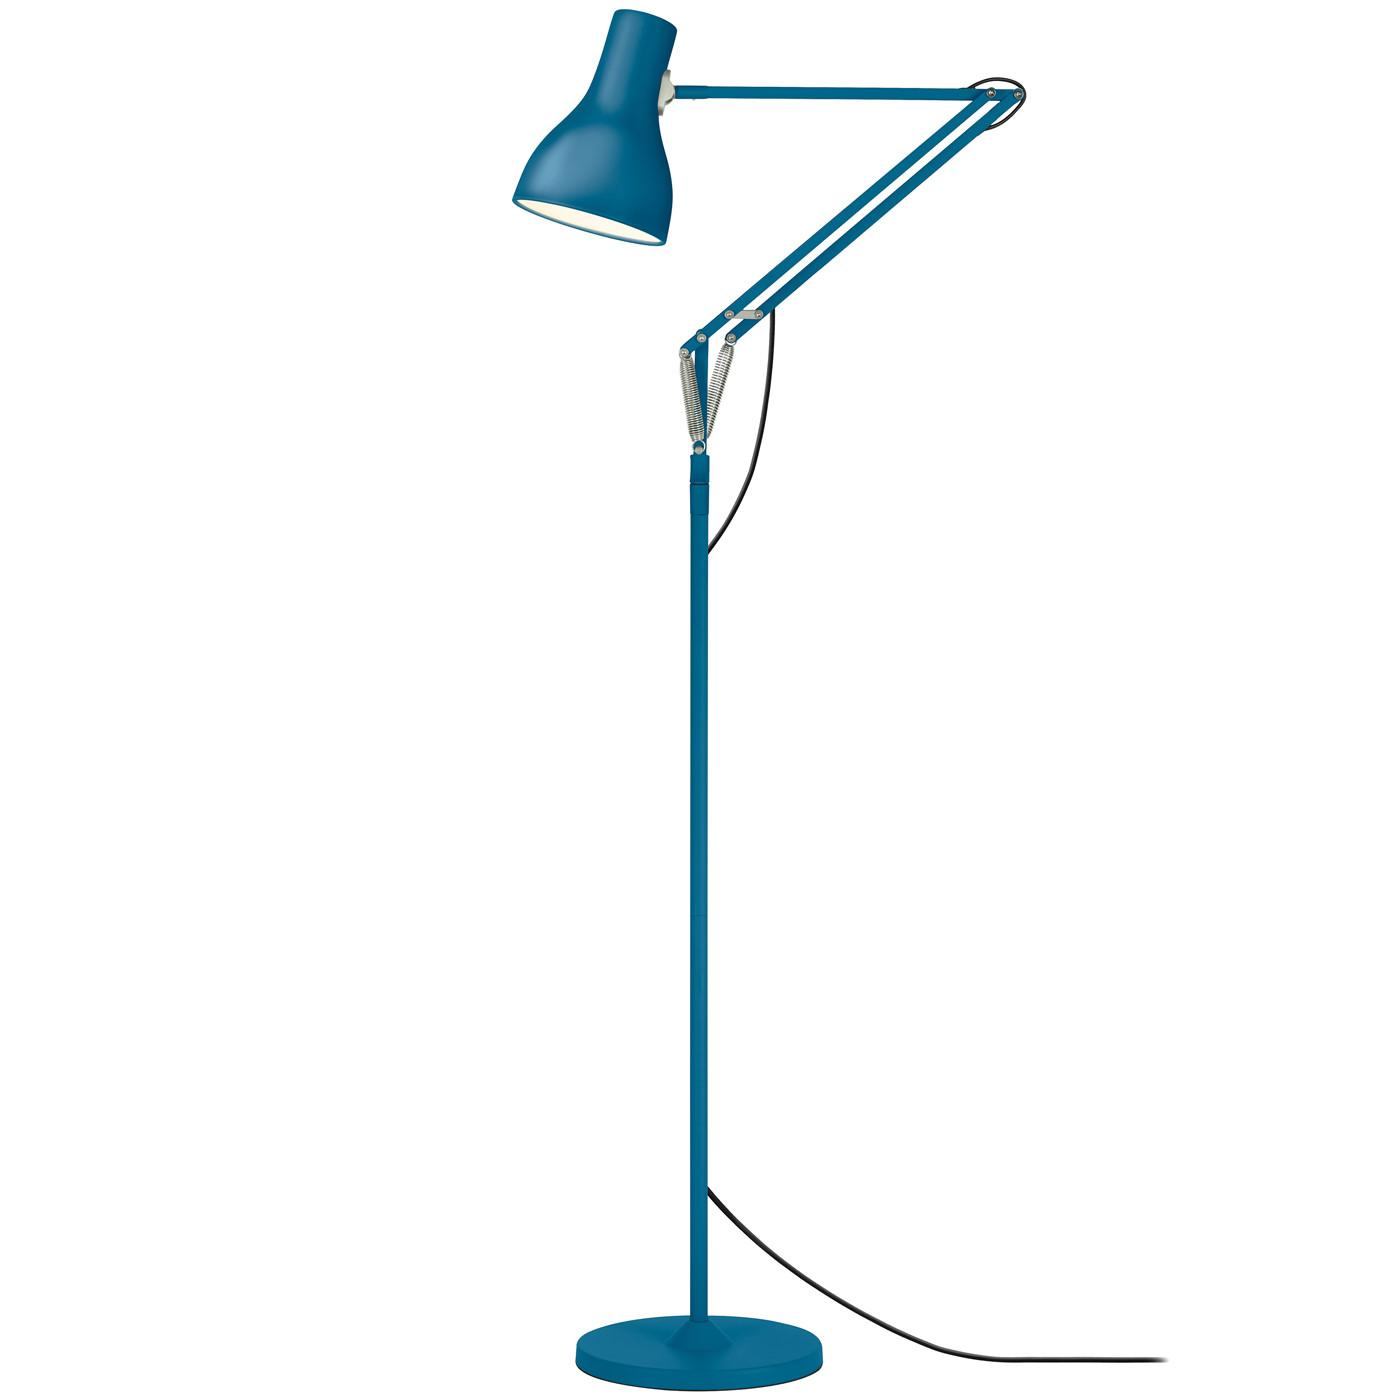 Anglepoise Type 75 Floor Lamp Margaret Howell Edition